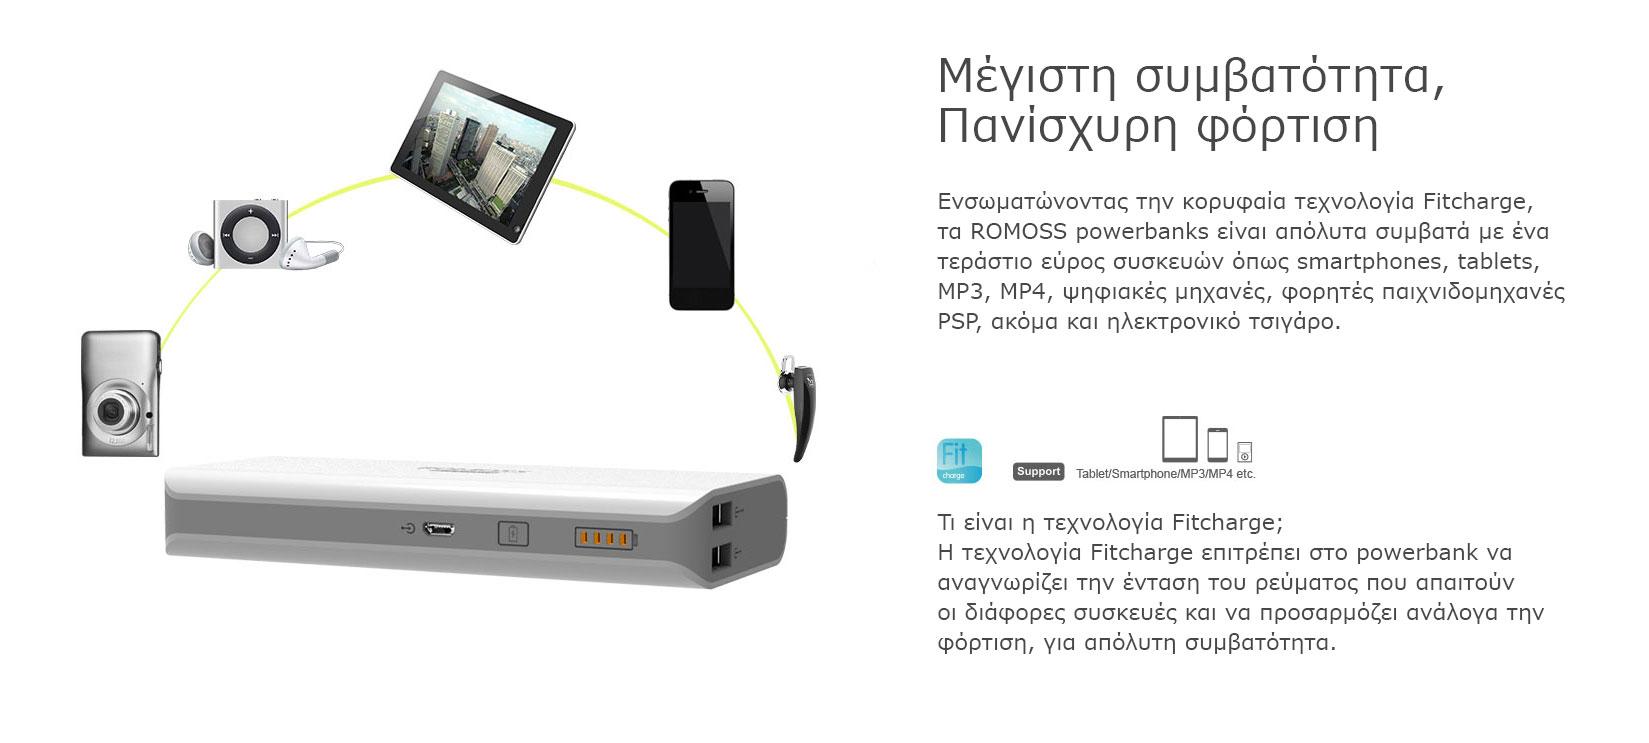 romoss-powerbanks-texnologia1